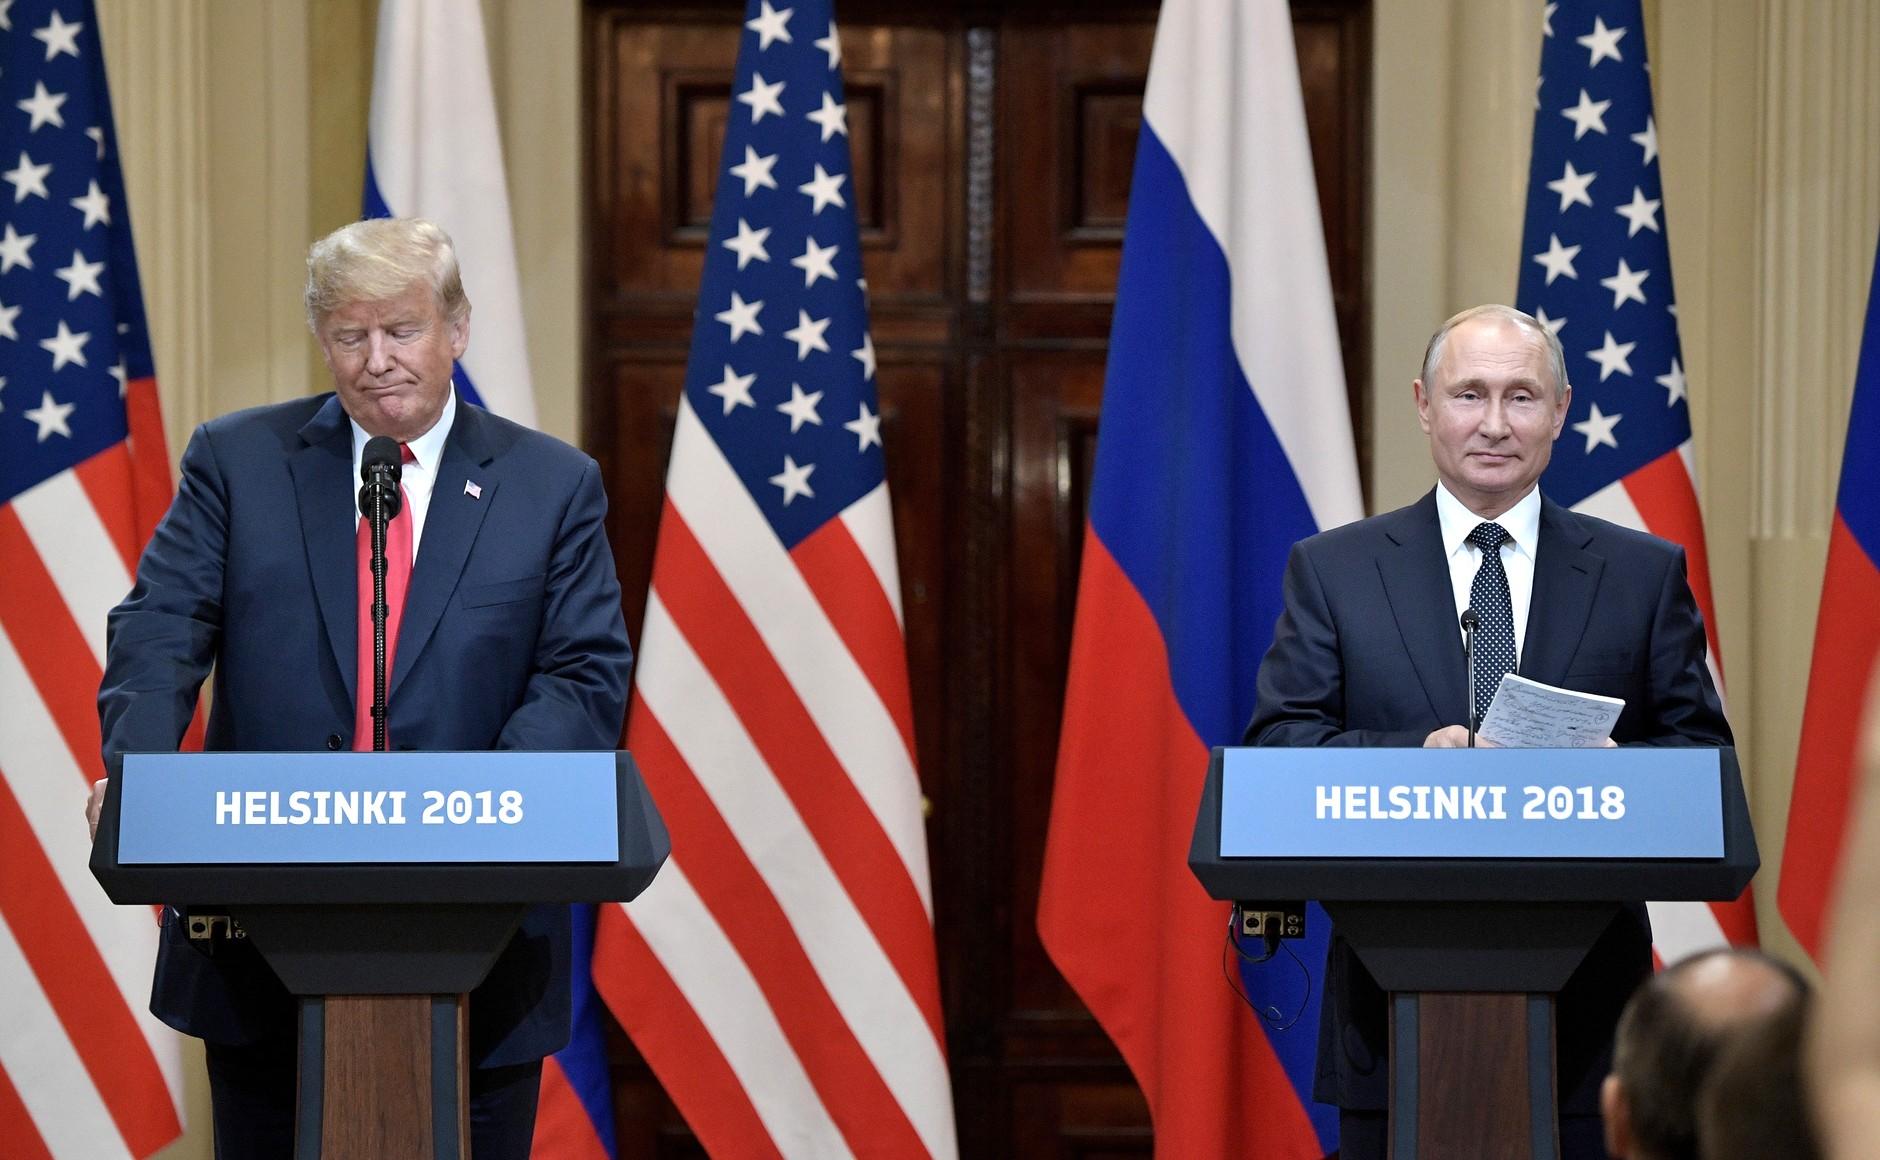 Vladimir_Putin_&_Donald_Trump_in_Helsinki,_16_July_2018_(8).jpg